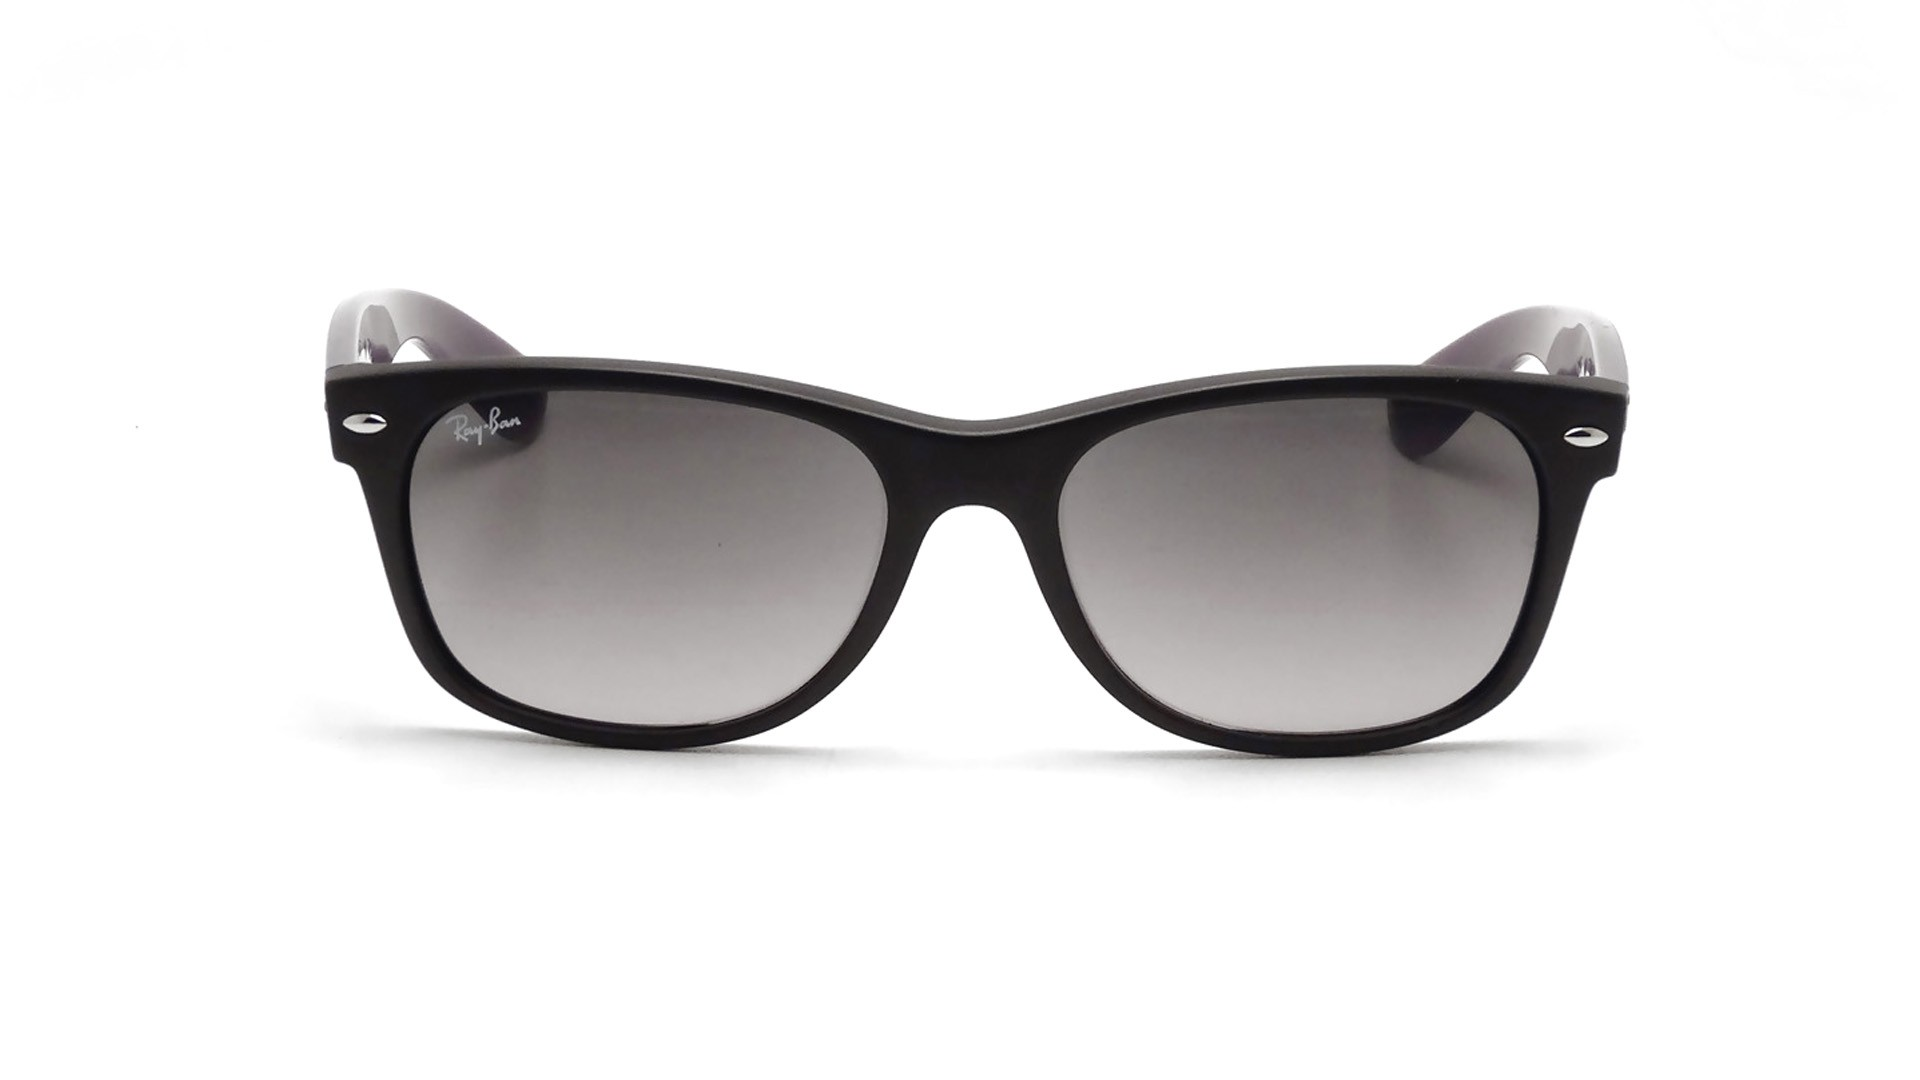 ray ban sunglasses new wayfarer  Ban New Wayfarer Black RB2132 6183/71 55-18